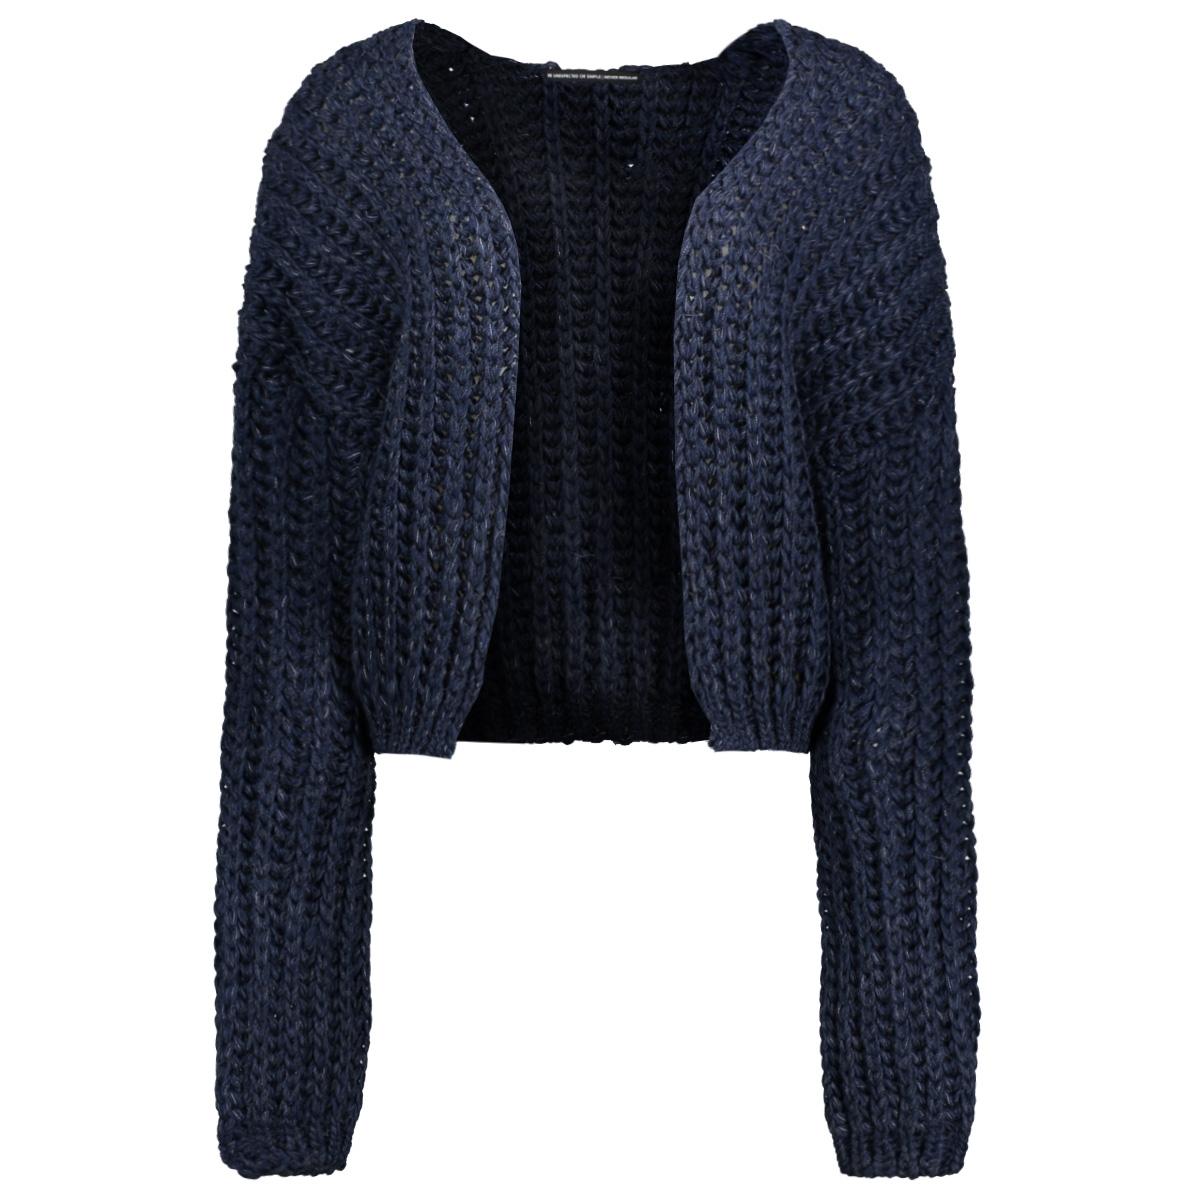 20-653-7103 10 days vest japanese blue